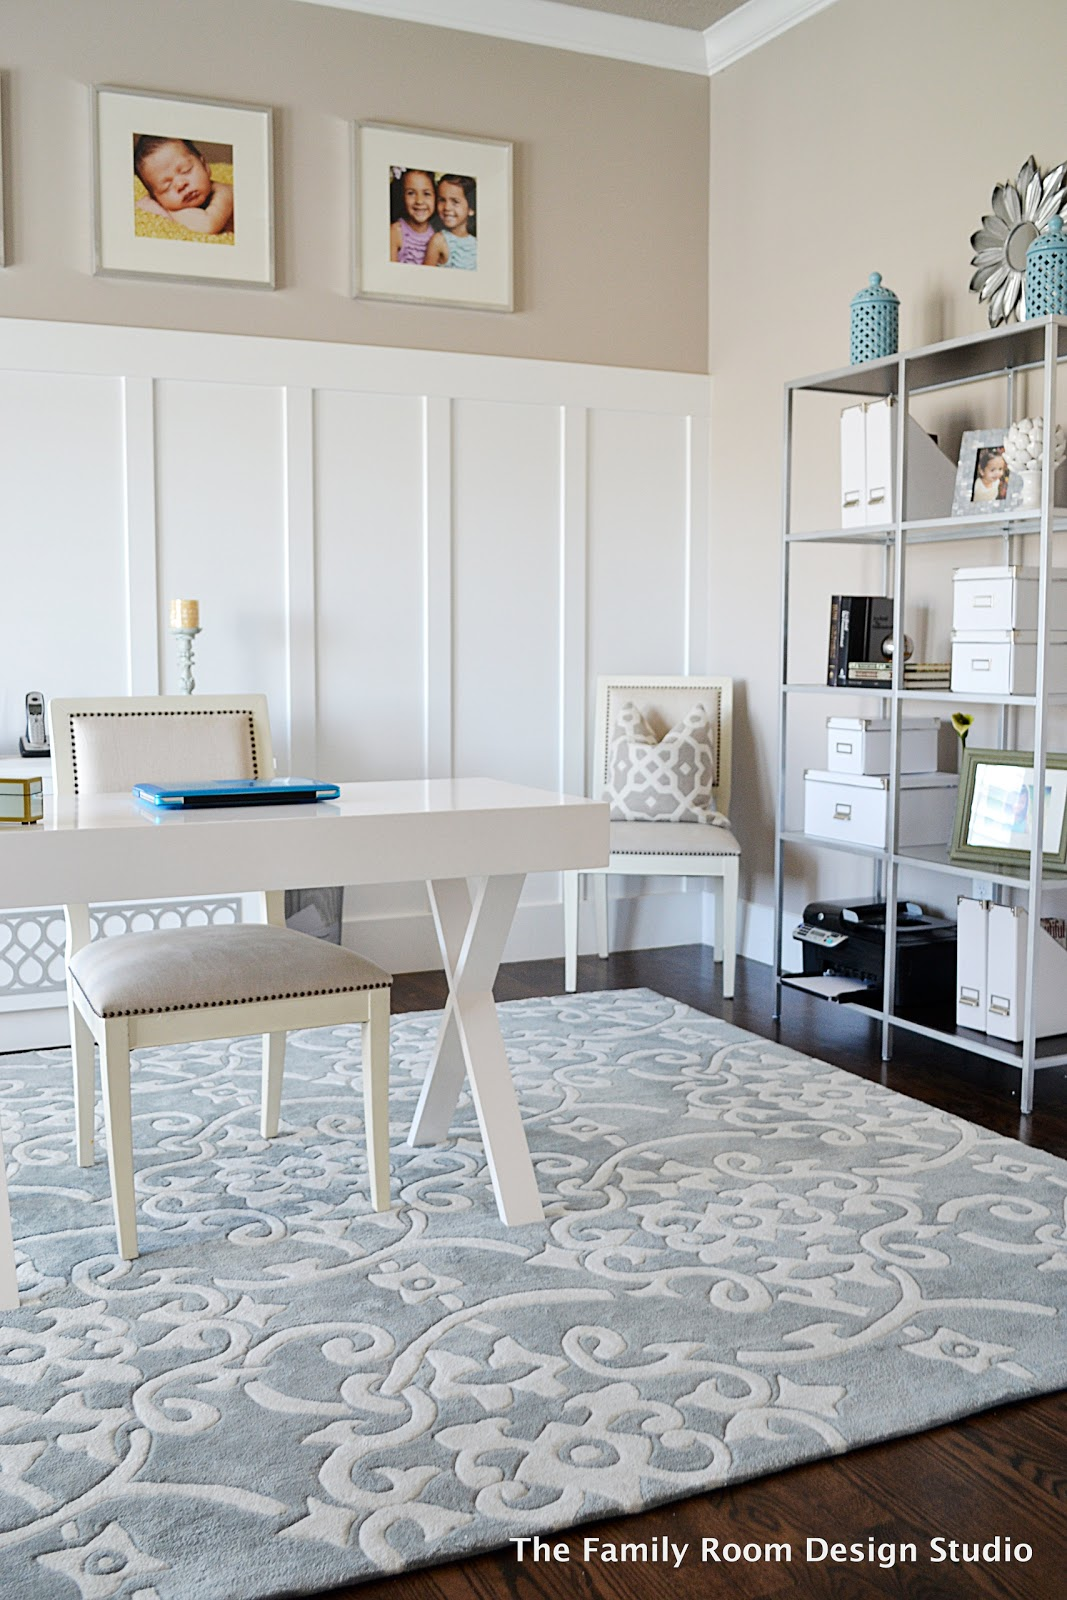 Sita montgomery interiors budget friendly decor - Home office design ideas on a budget ...